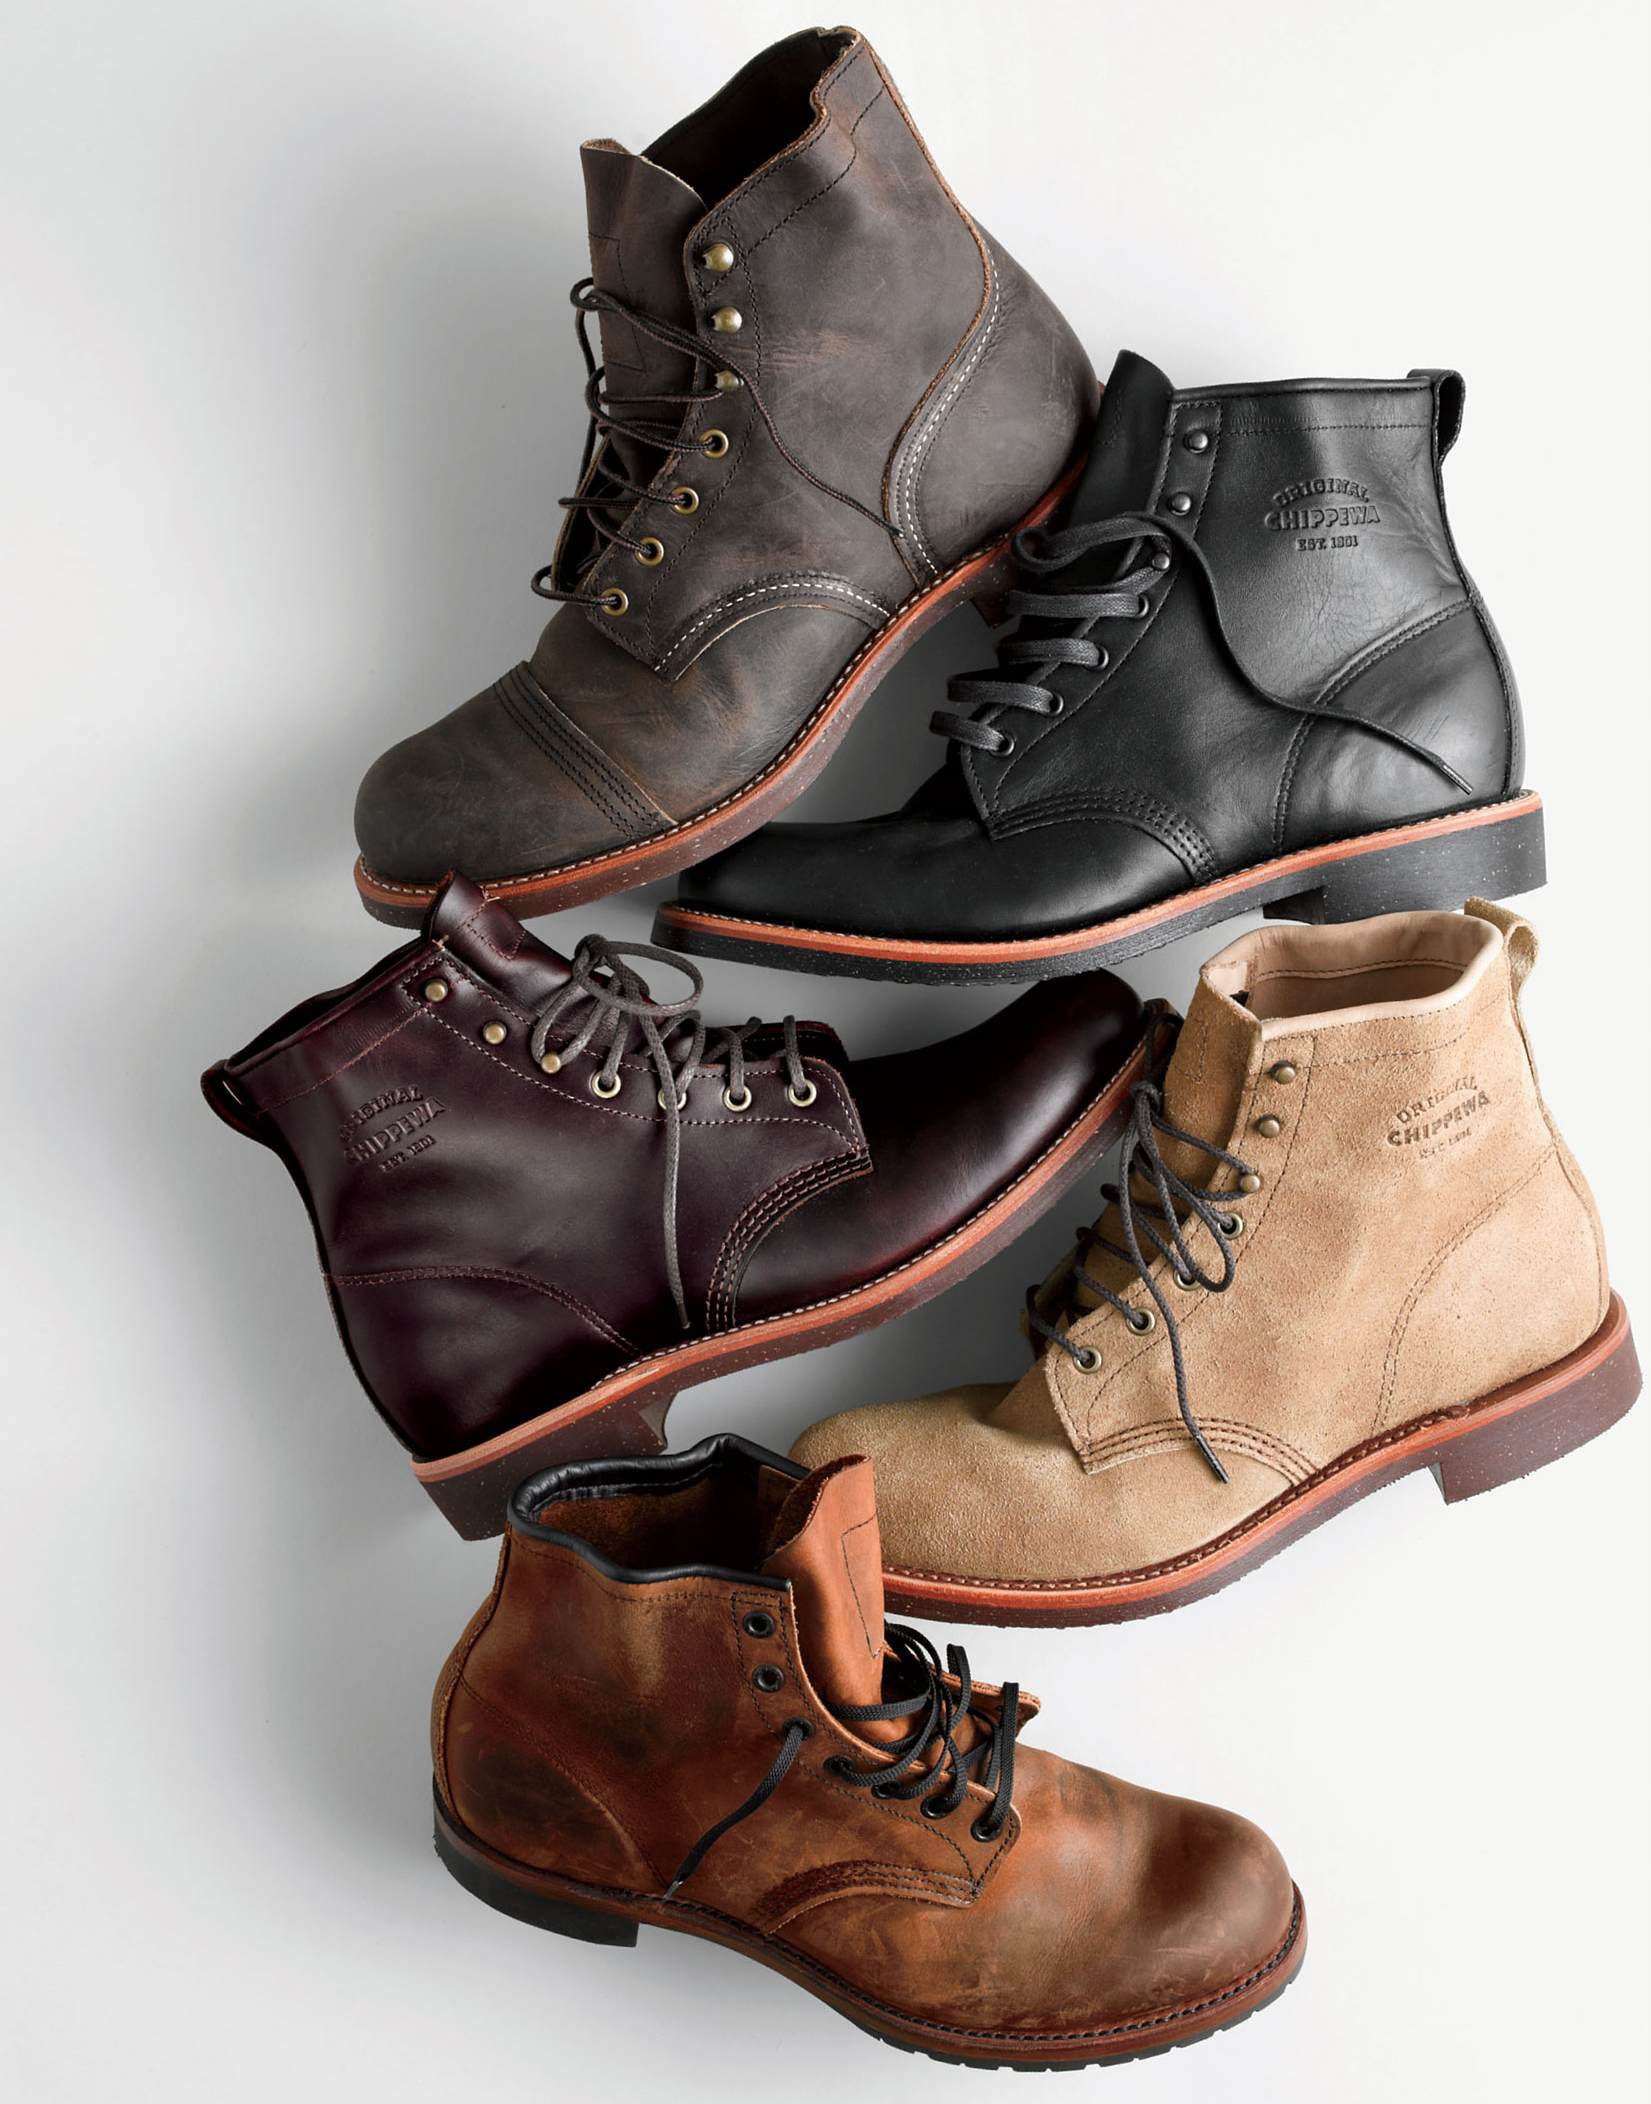 Chippewa_boots_shoes_image.jpg